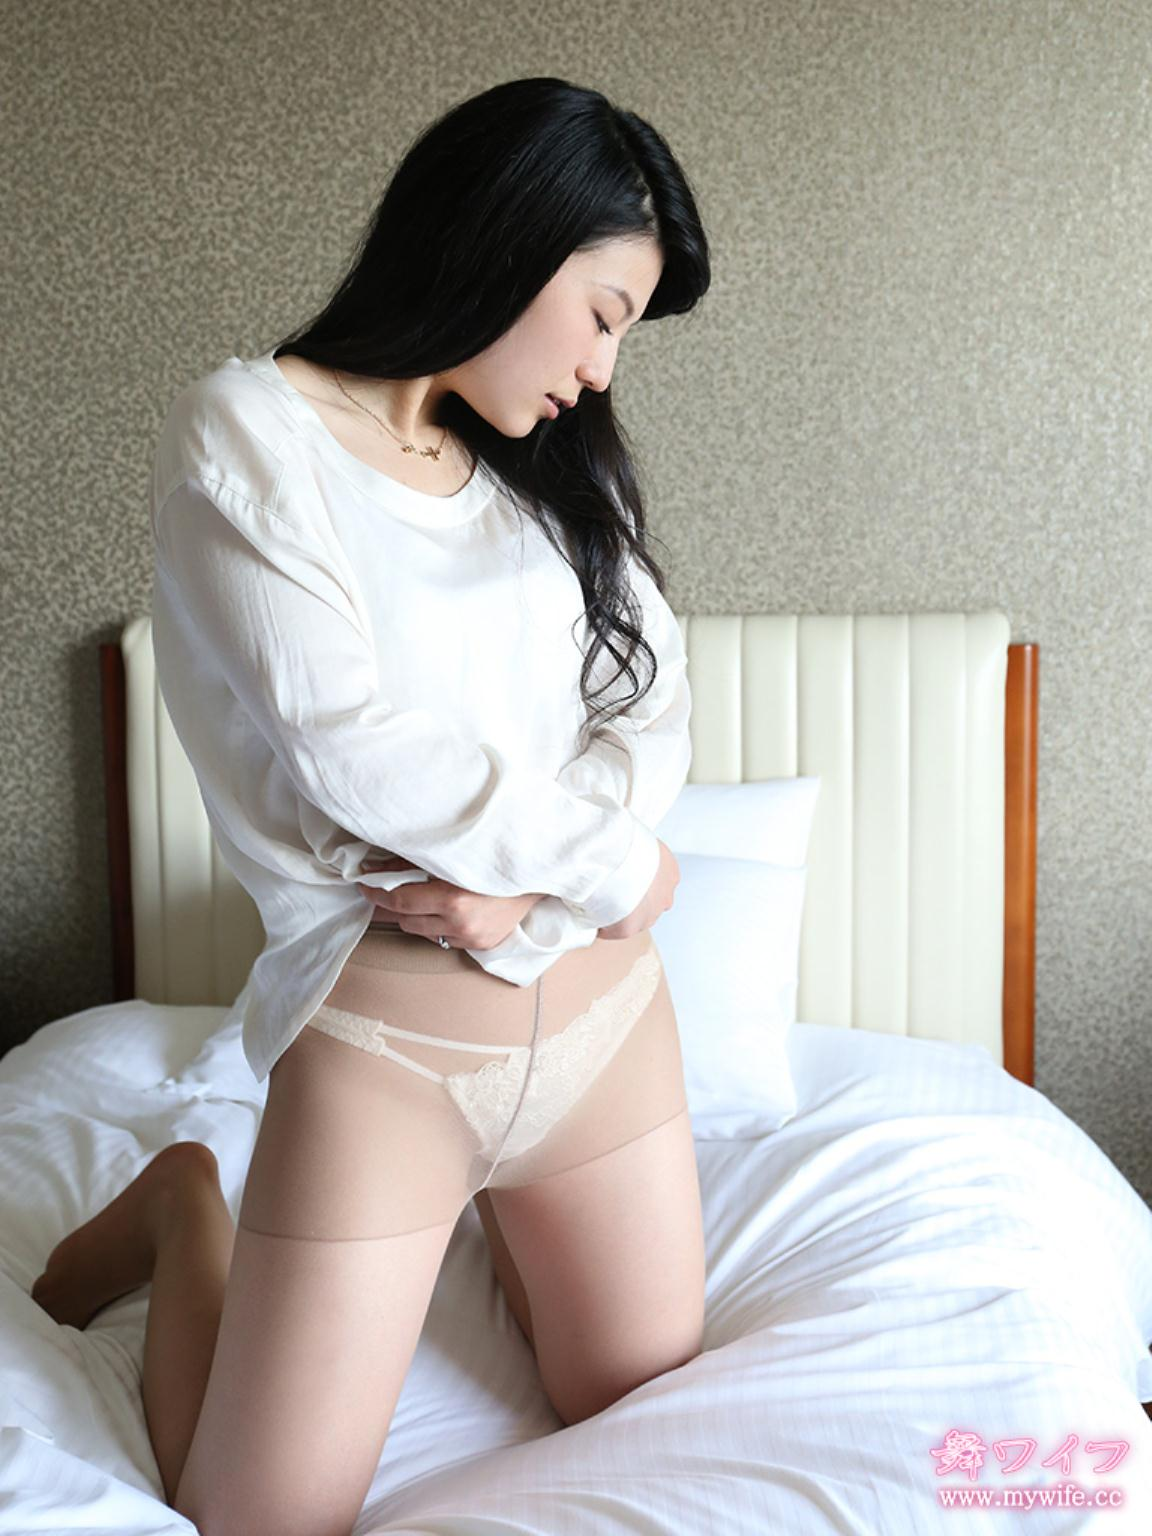 Mywife-00737 中村 唯花 YUIKA_NAKAMURA 再會篇 无圣光写真套图